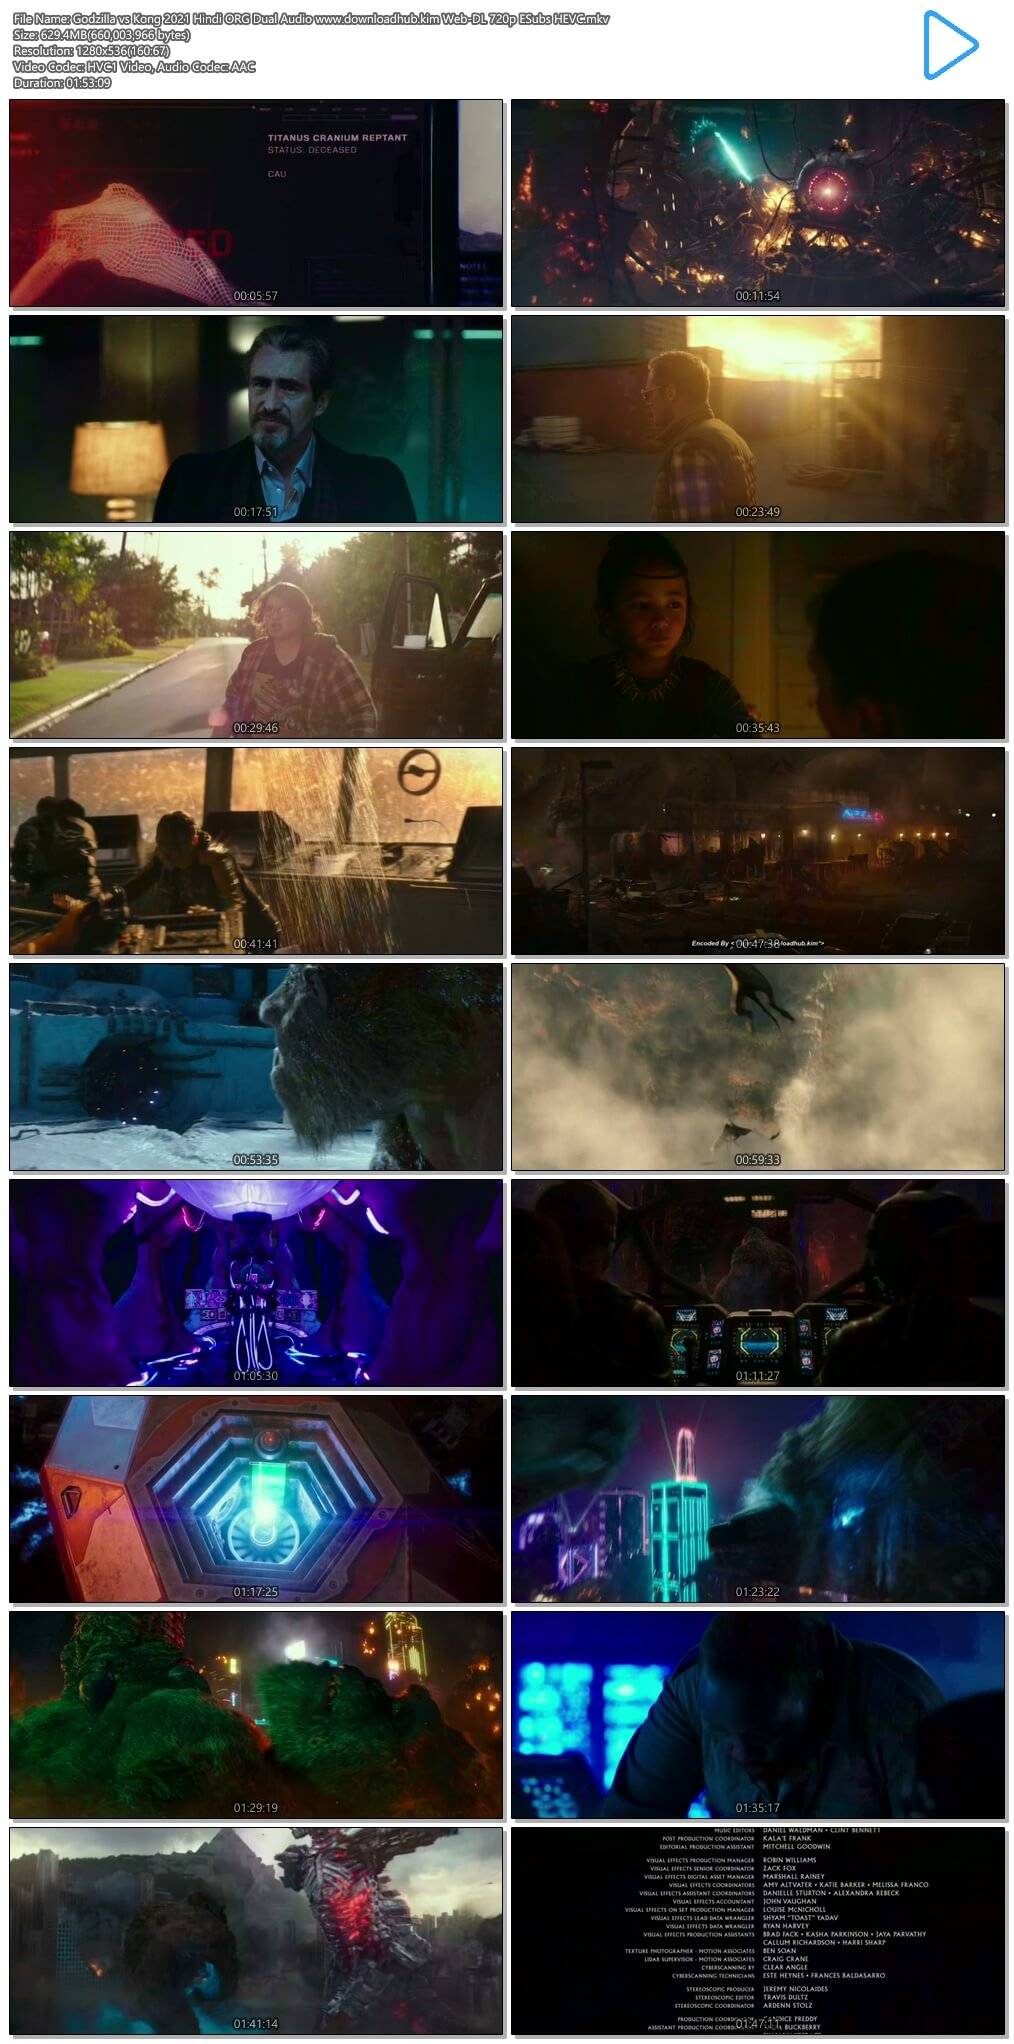 Godzilla vs Kong 2021 Hindi ORG Dual Audio 600MB Web-DL 720p ESubs HEVC